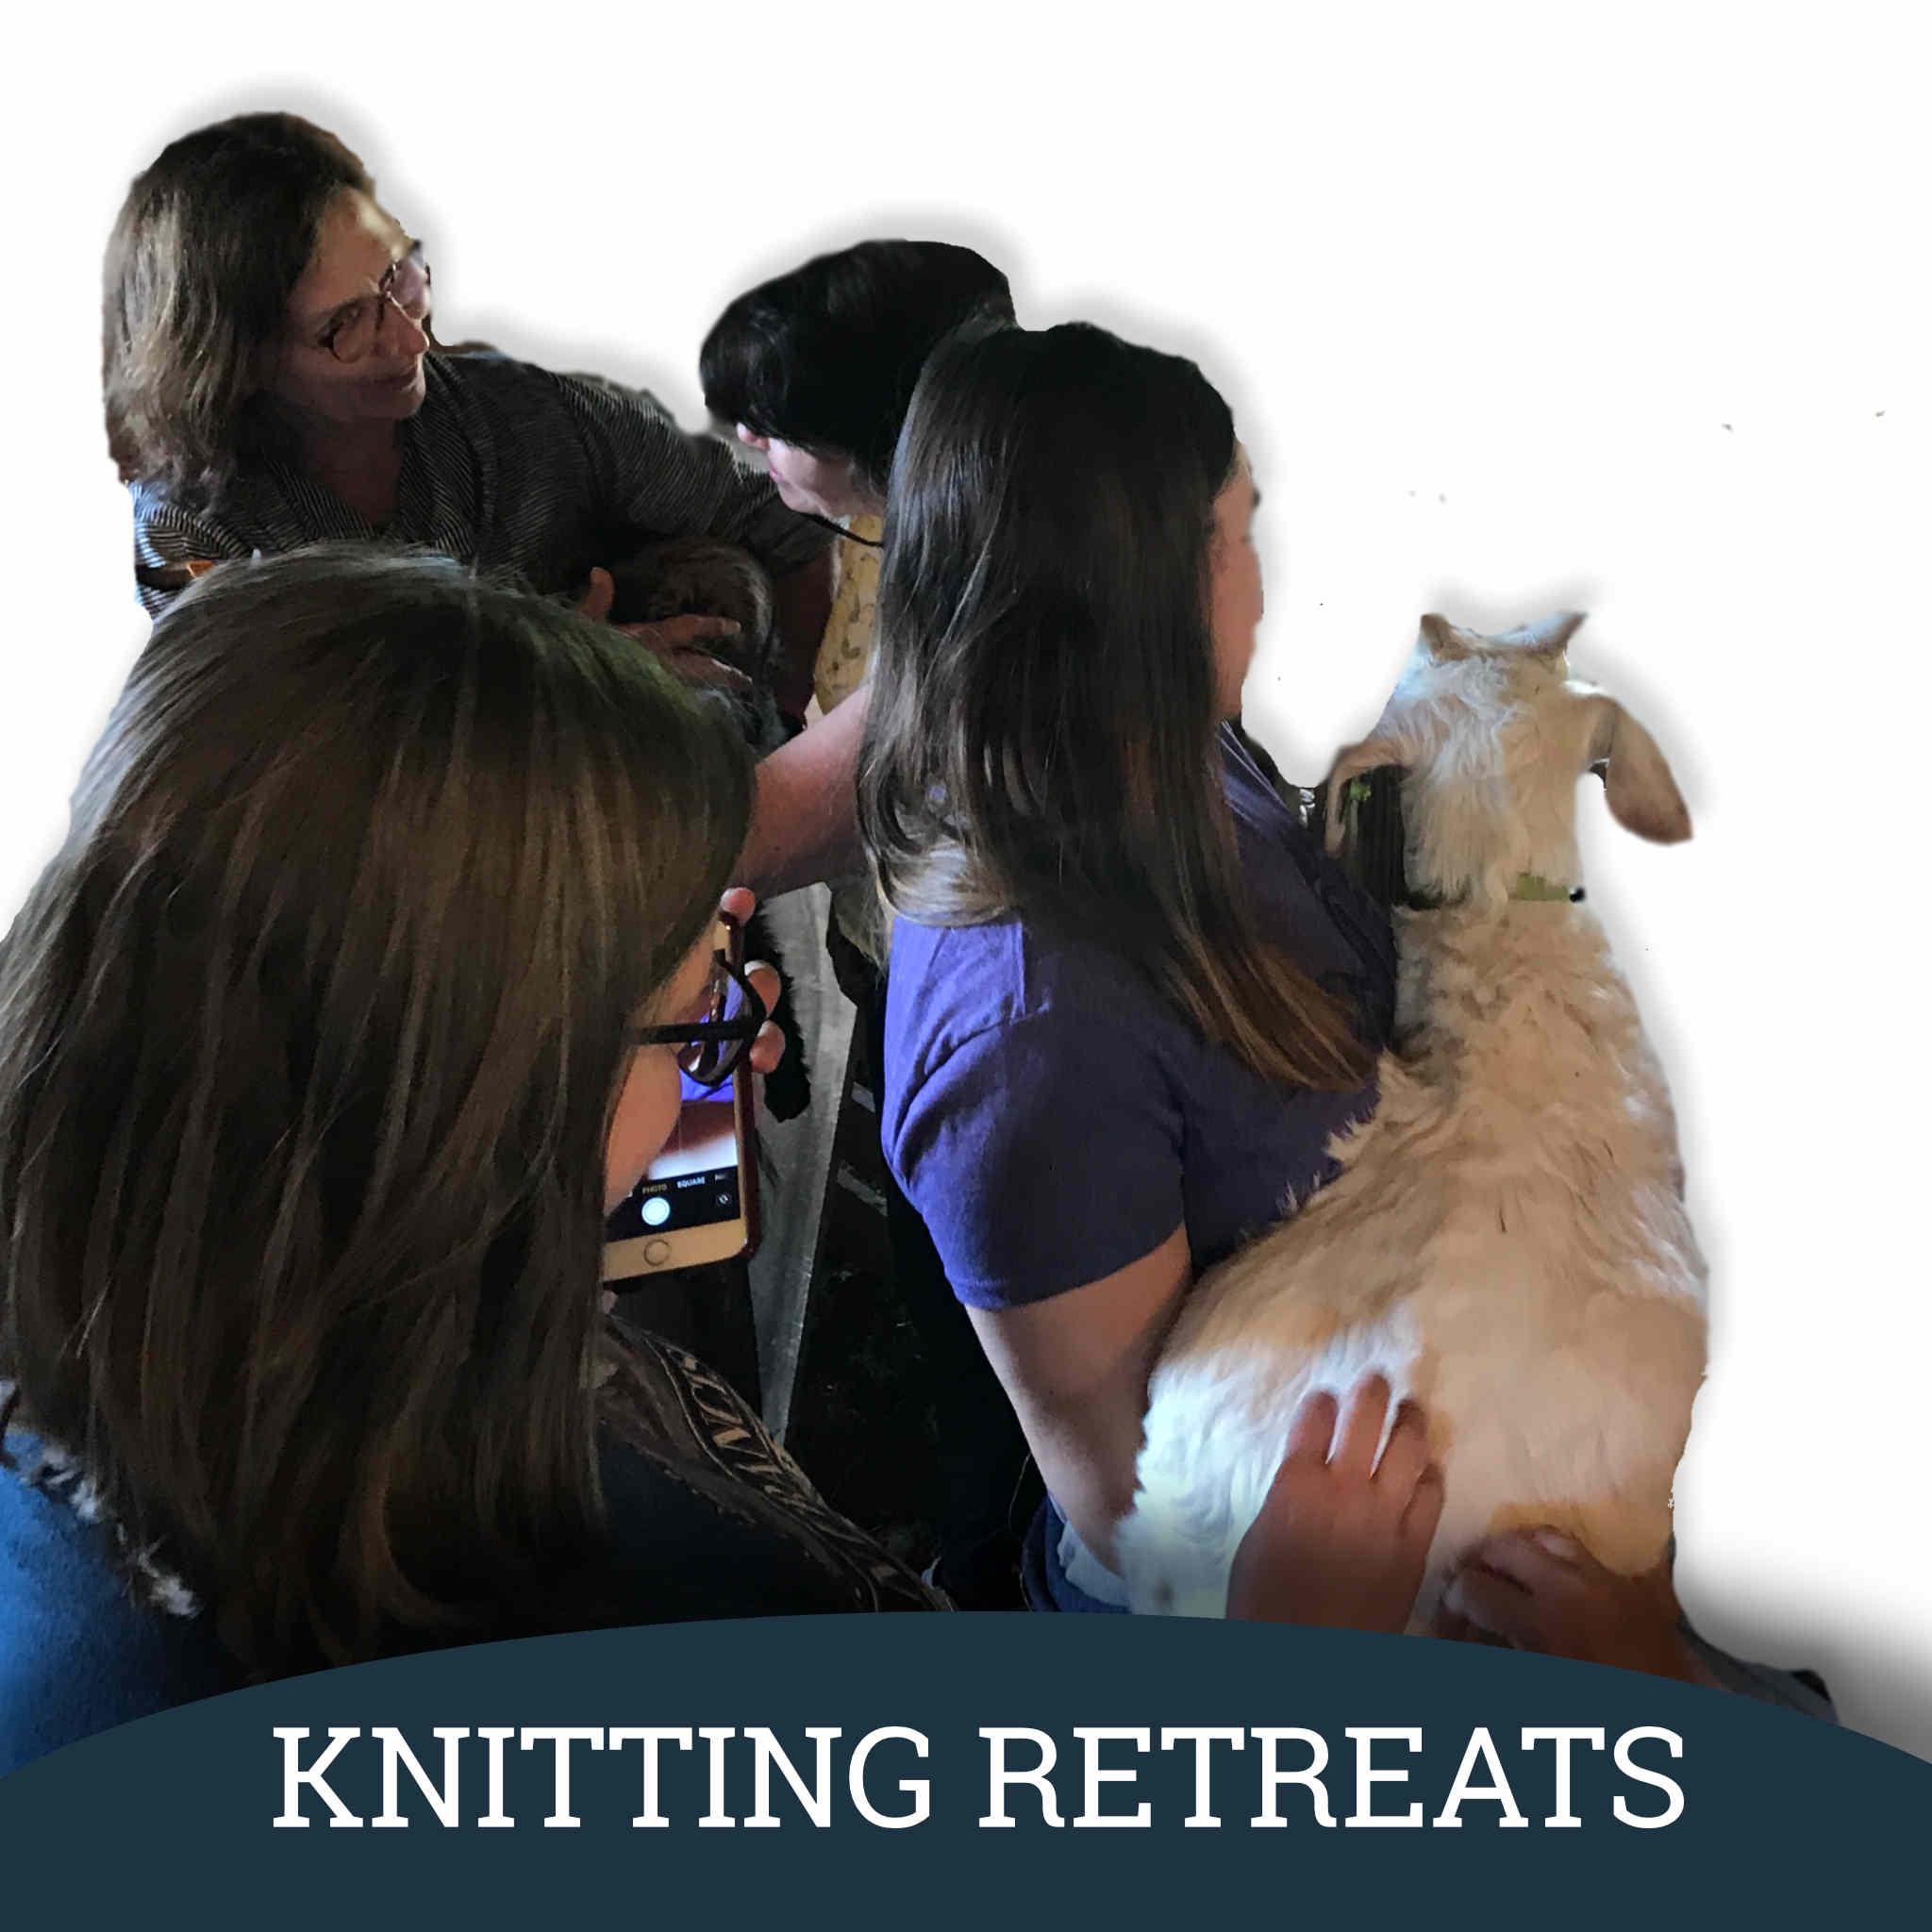 Vermont Knitting Retreats